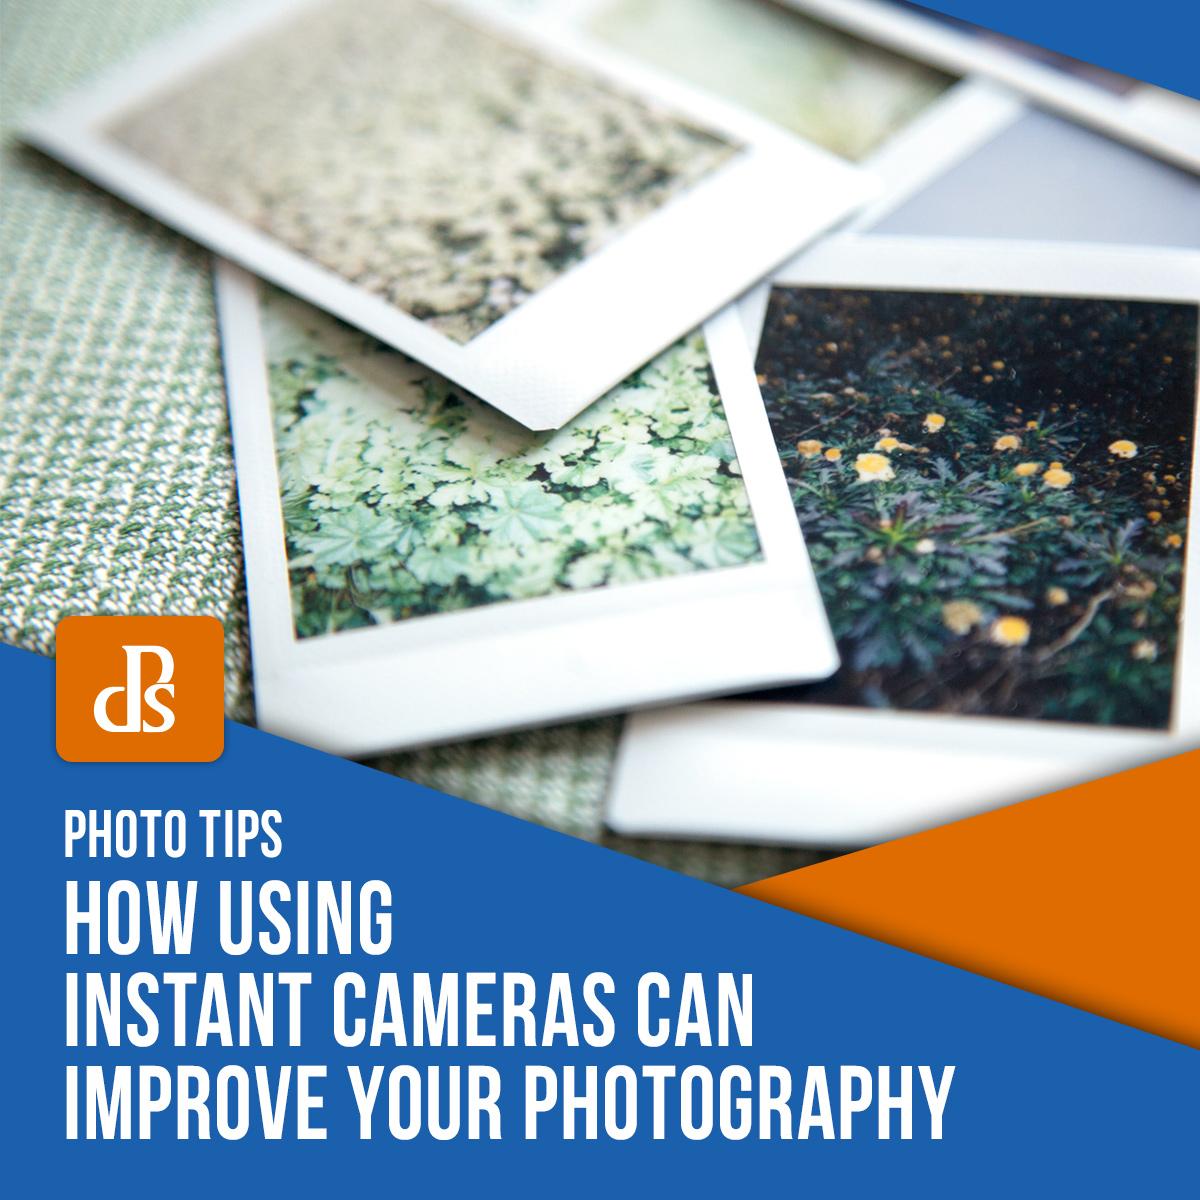 dps-using-instant-cameras